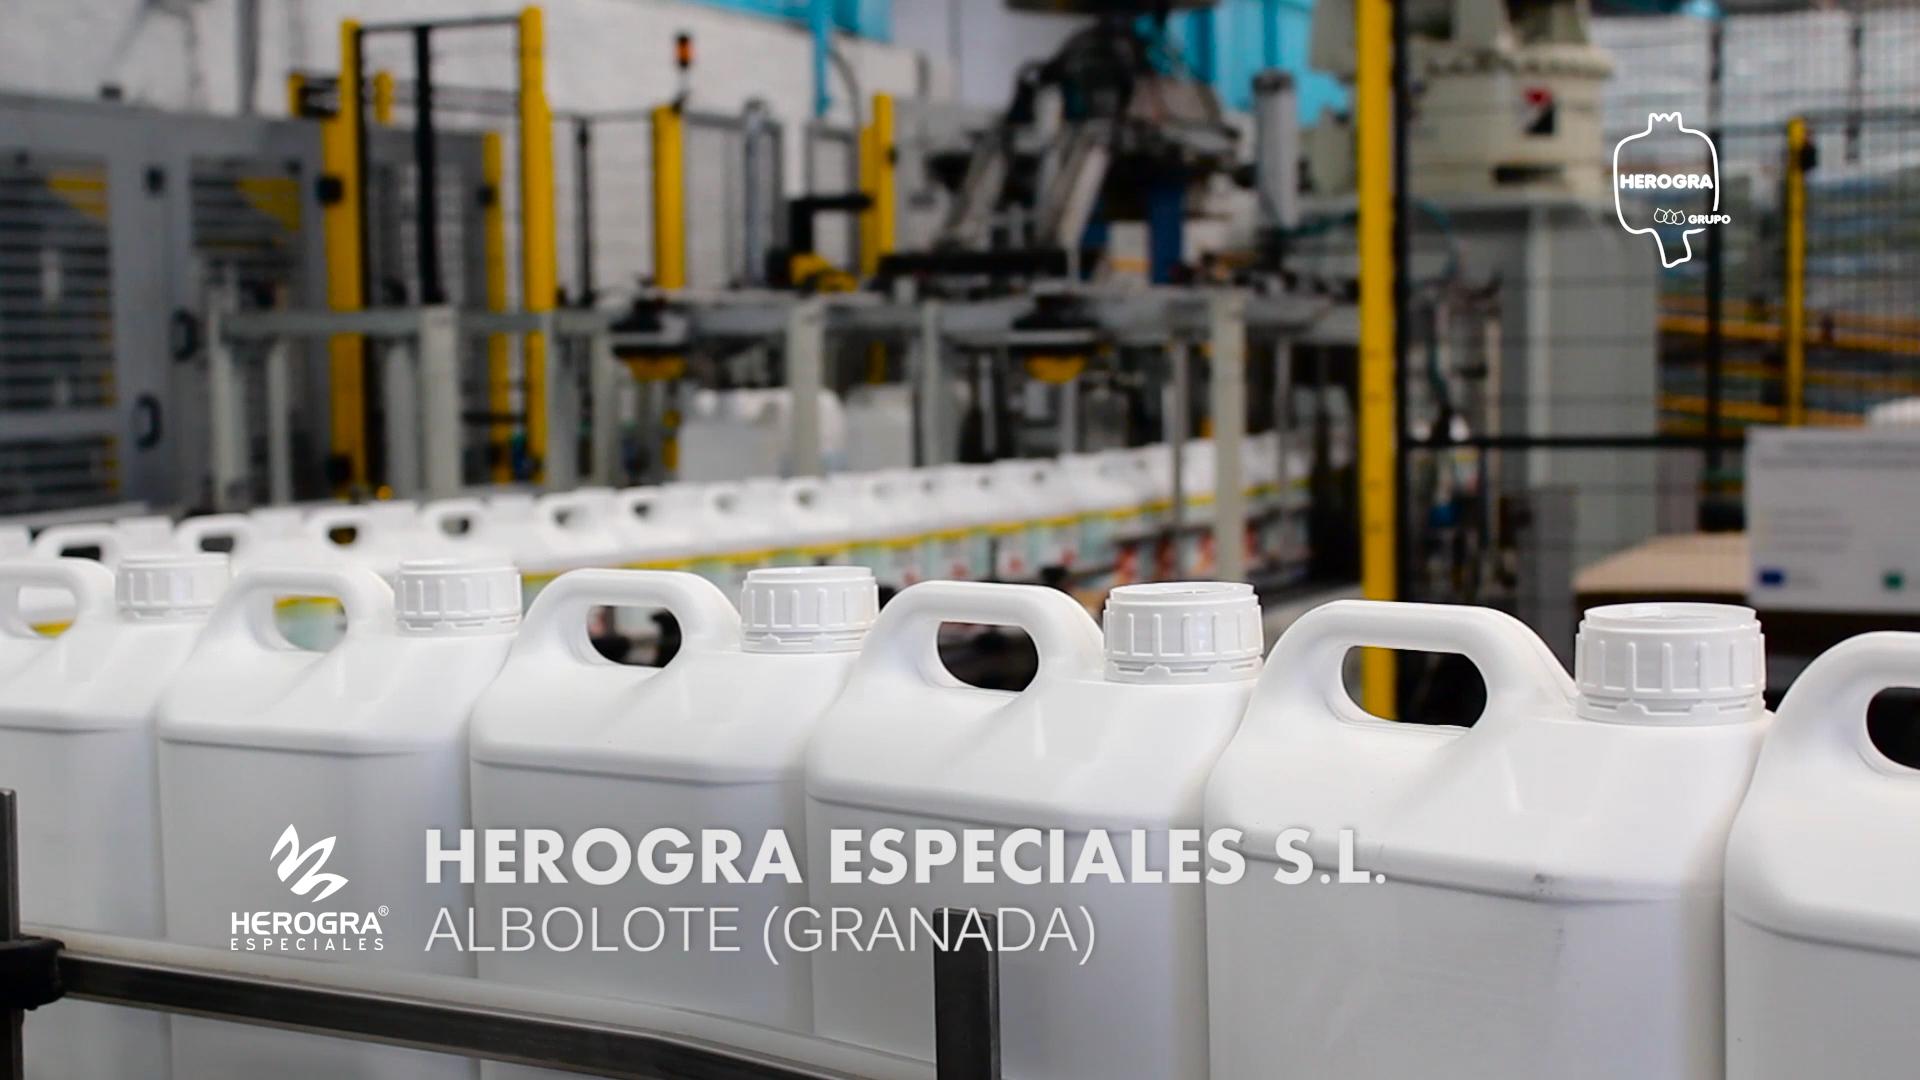 Herogra